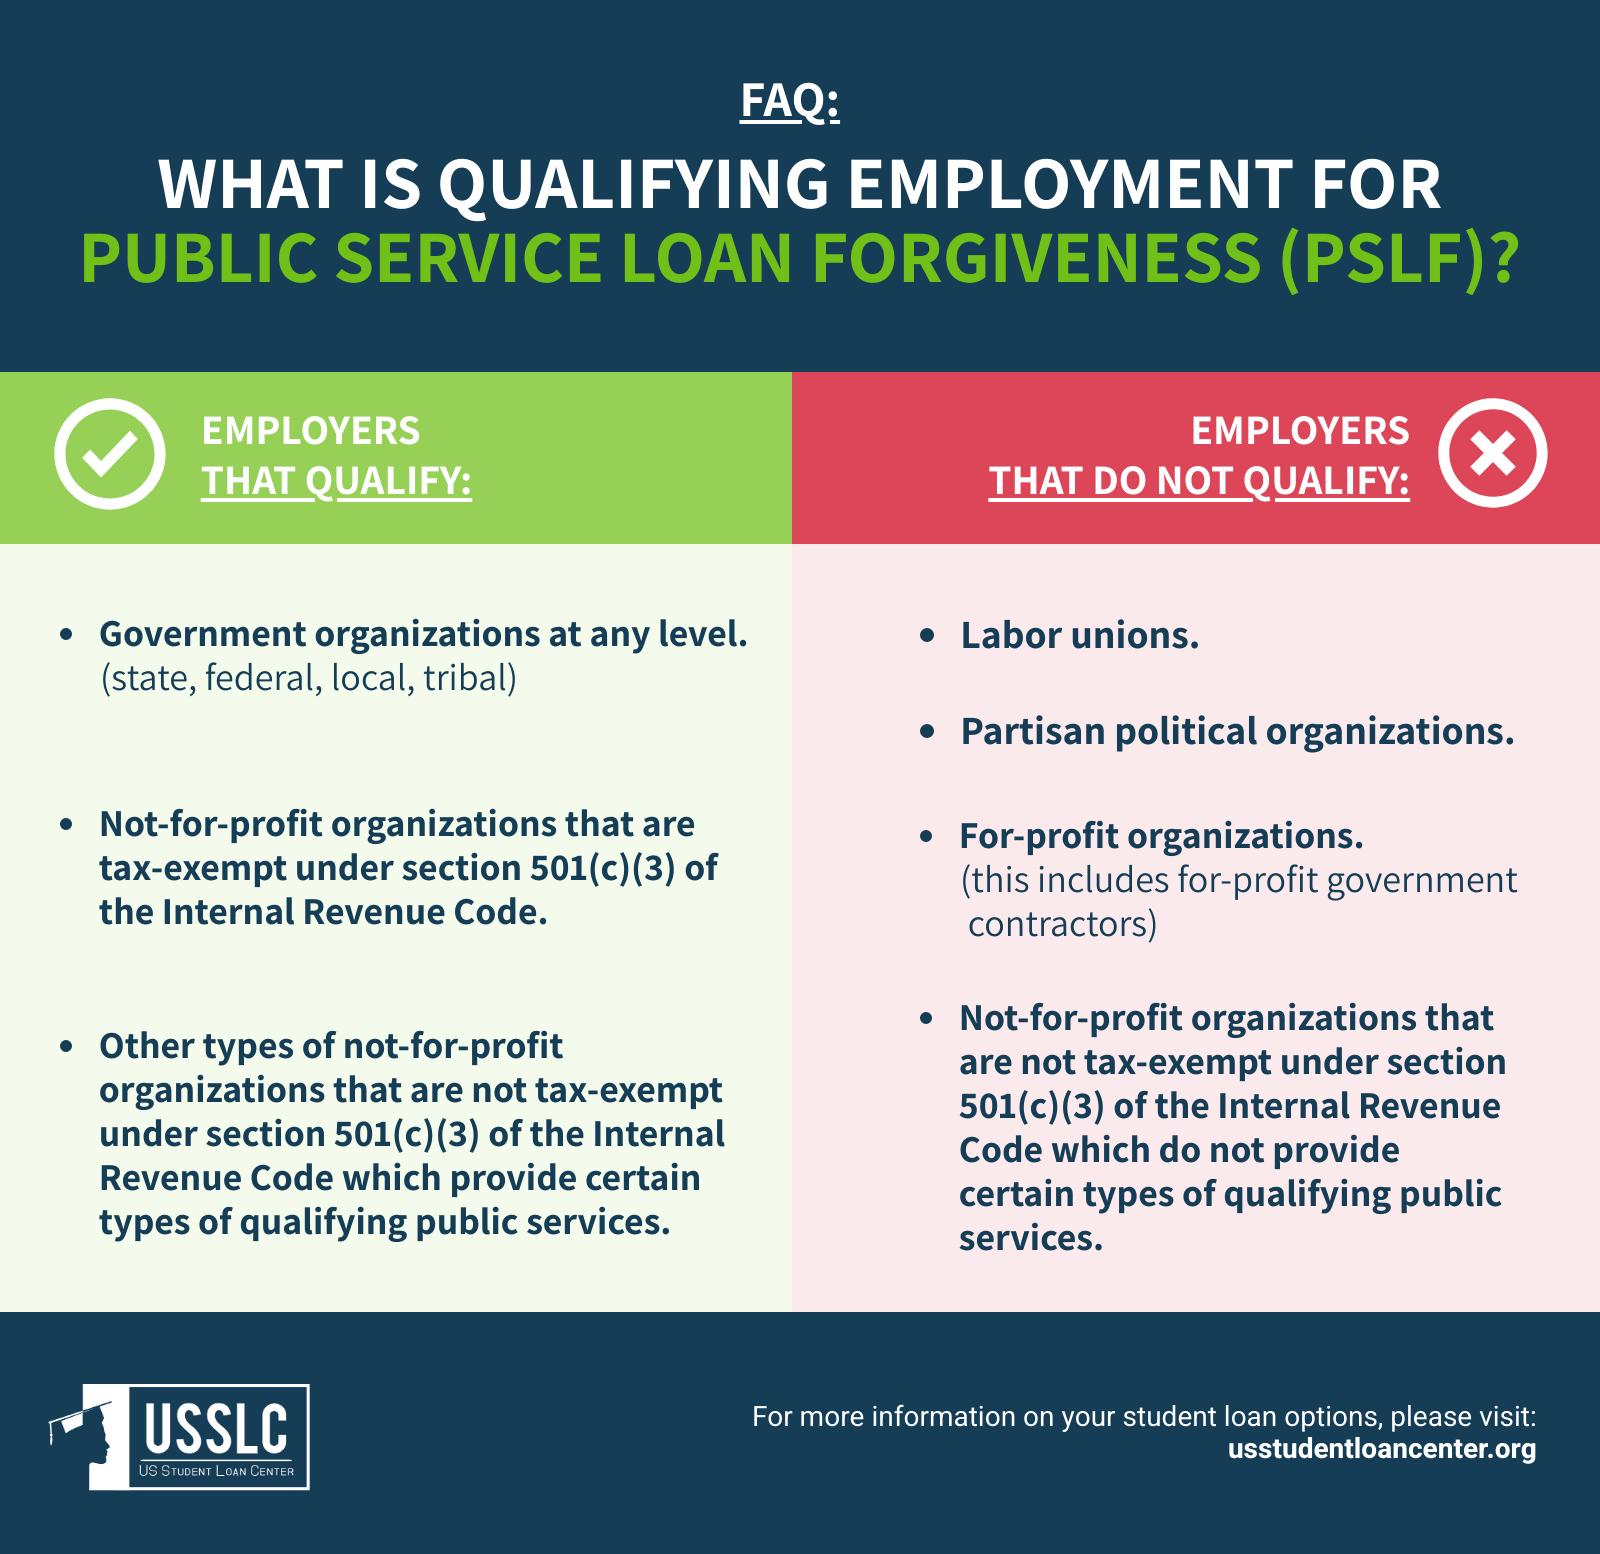 Public Service Loan Forgiveness Qualifying Employment